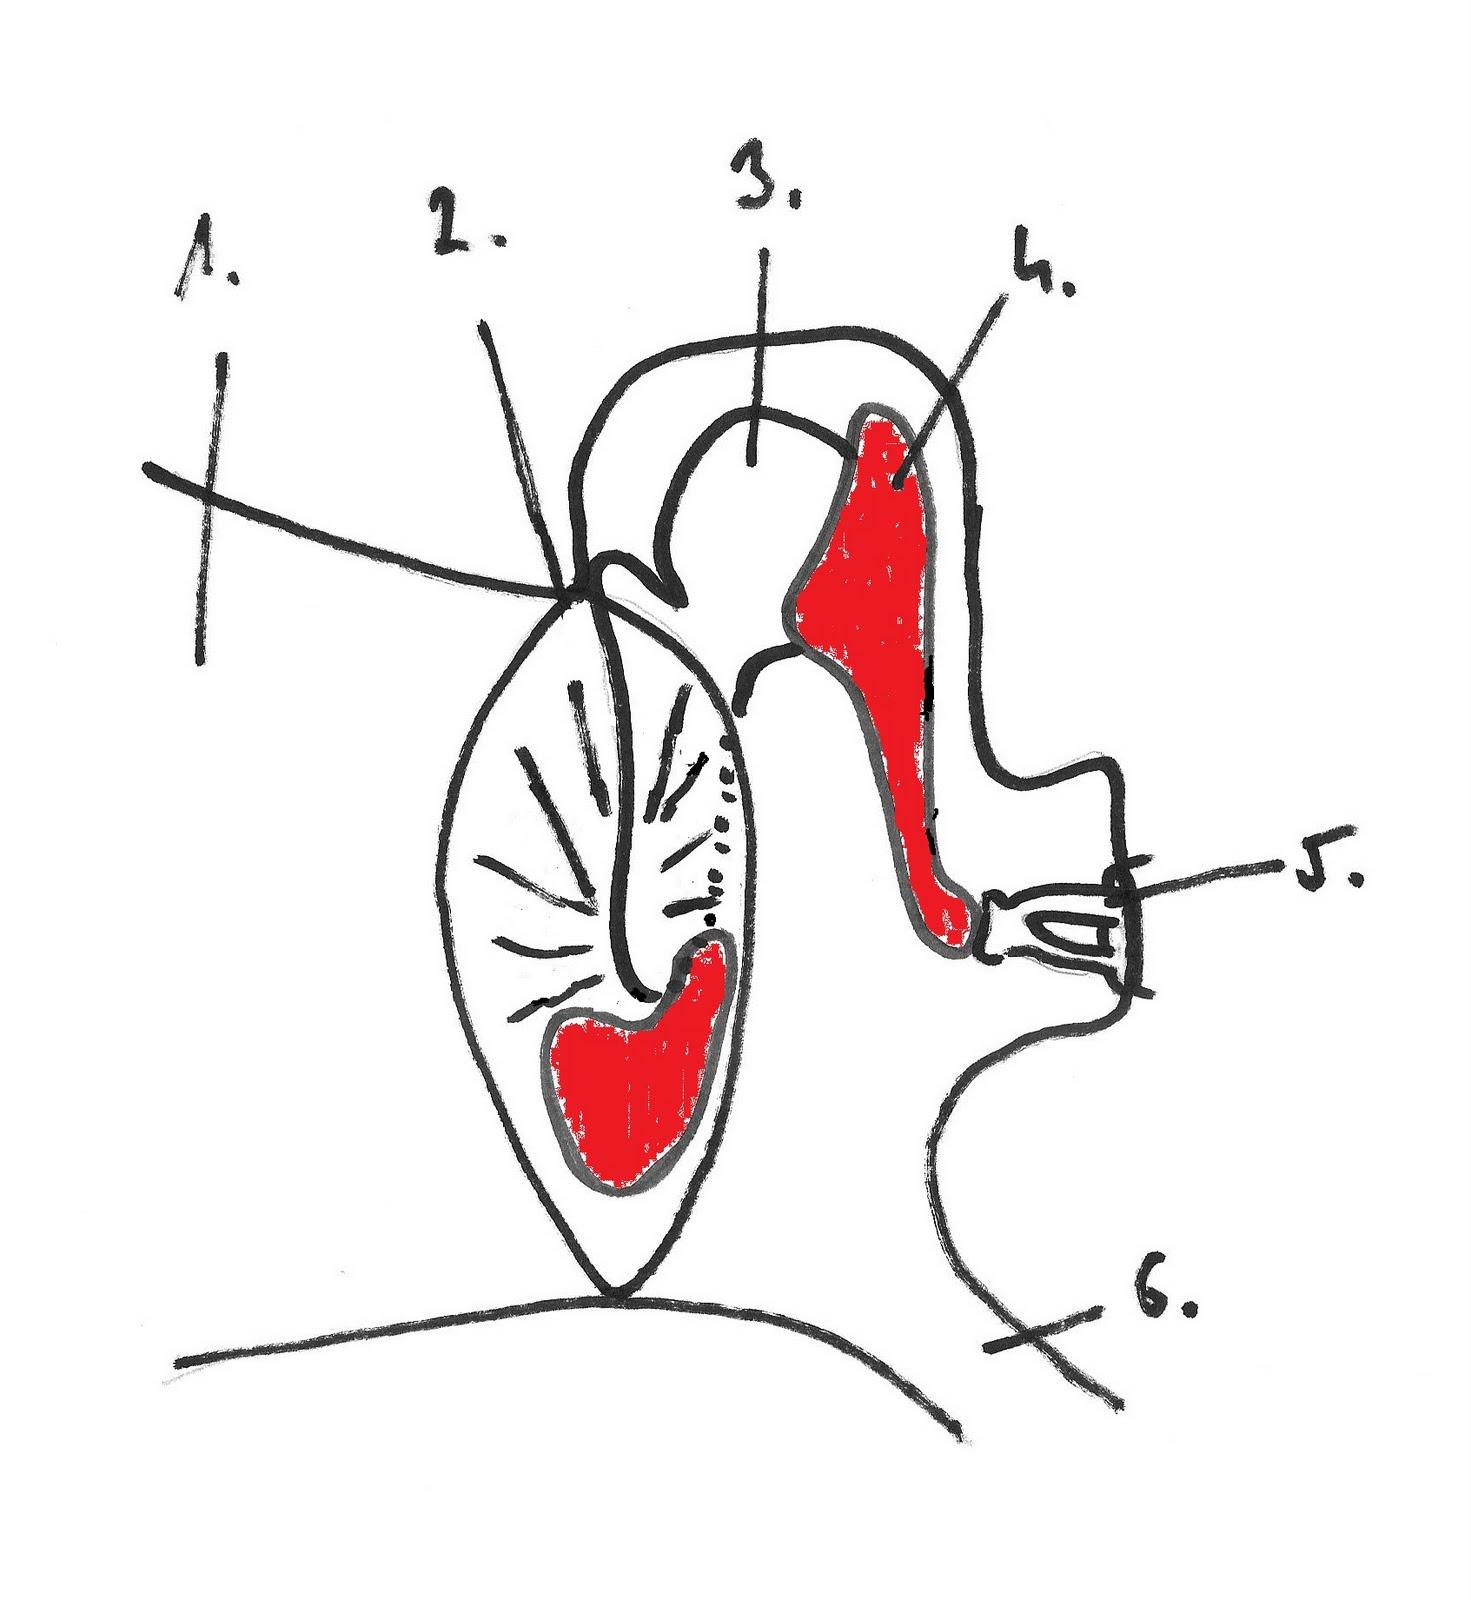 a preauricularis papilloma azt jelenti